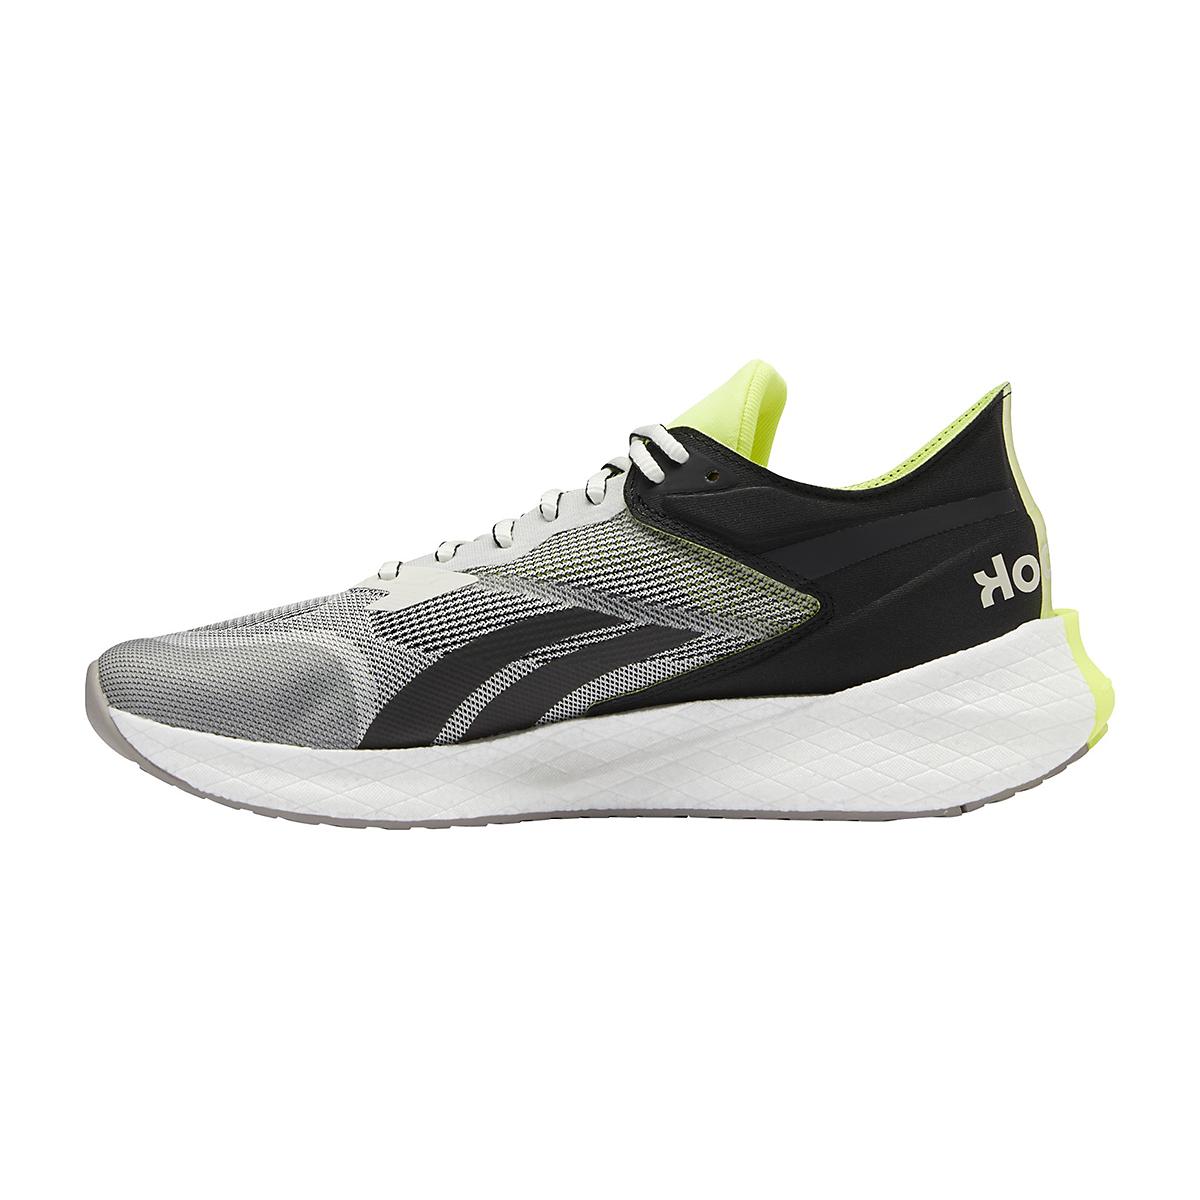 Men's Reebok Floatride Energy Symmetros Running Shoe - Color: Classic White/Core Black/Yellow Flare - Size: 7 - Width: Regular, Classic White/Core Black/Yellow Flare, large, image 2